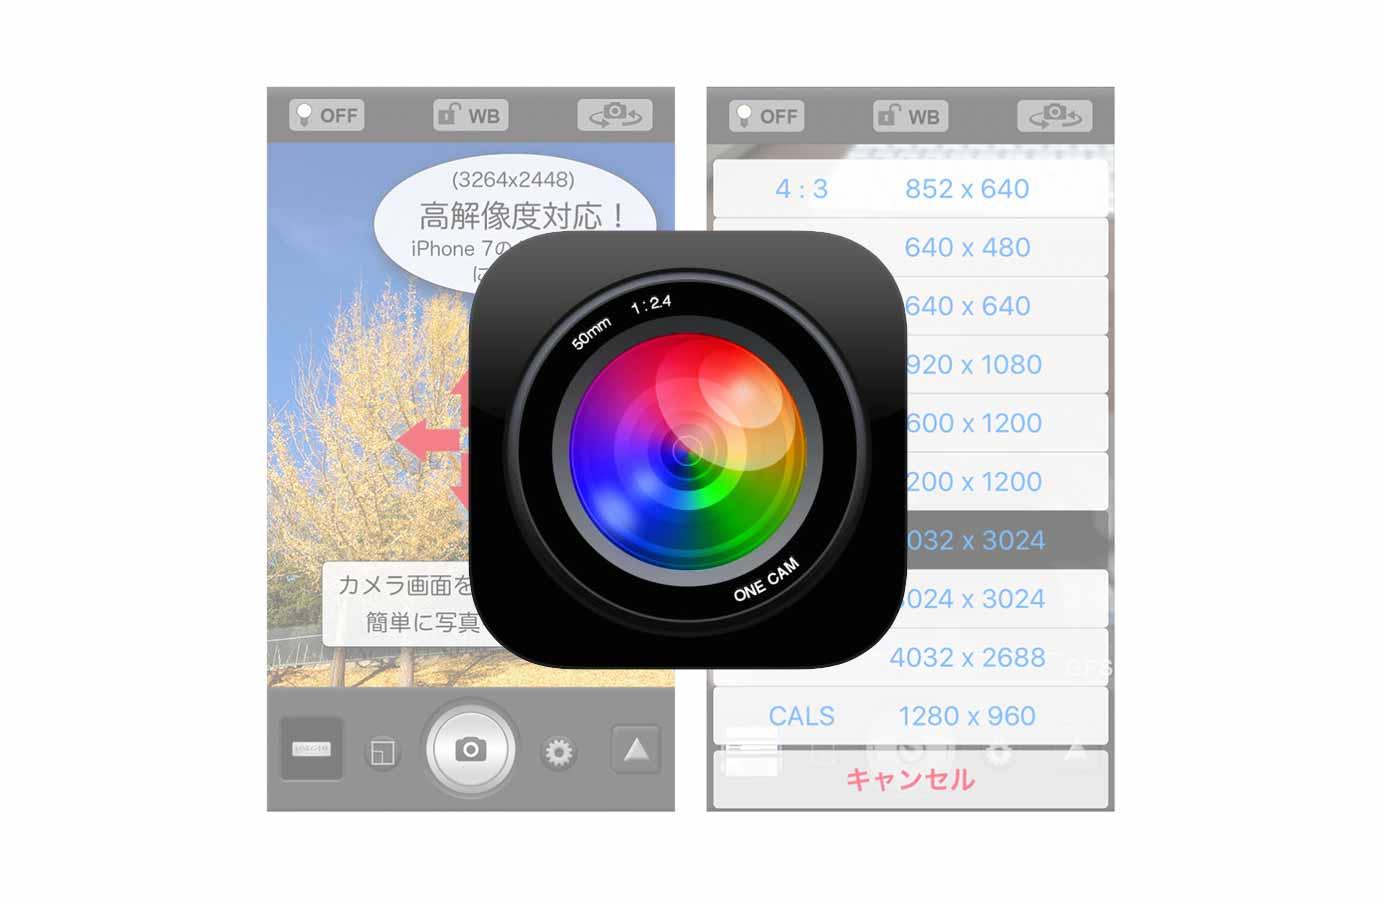 Walker Software、撮影と保存速度が高速化された高画質対応静音カメラアプリ「OneCam 5.9.0」リリース